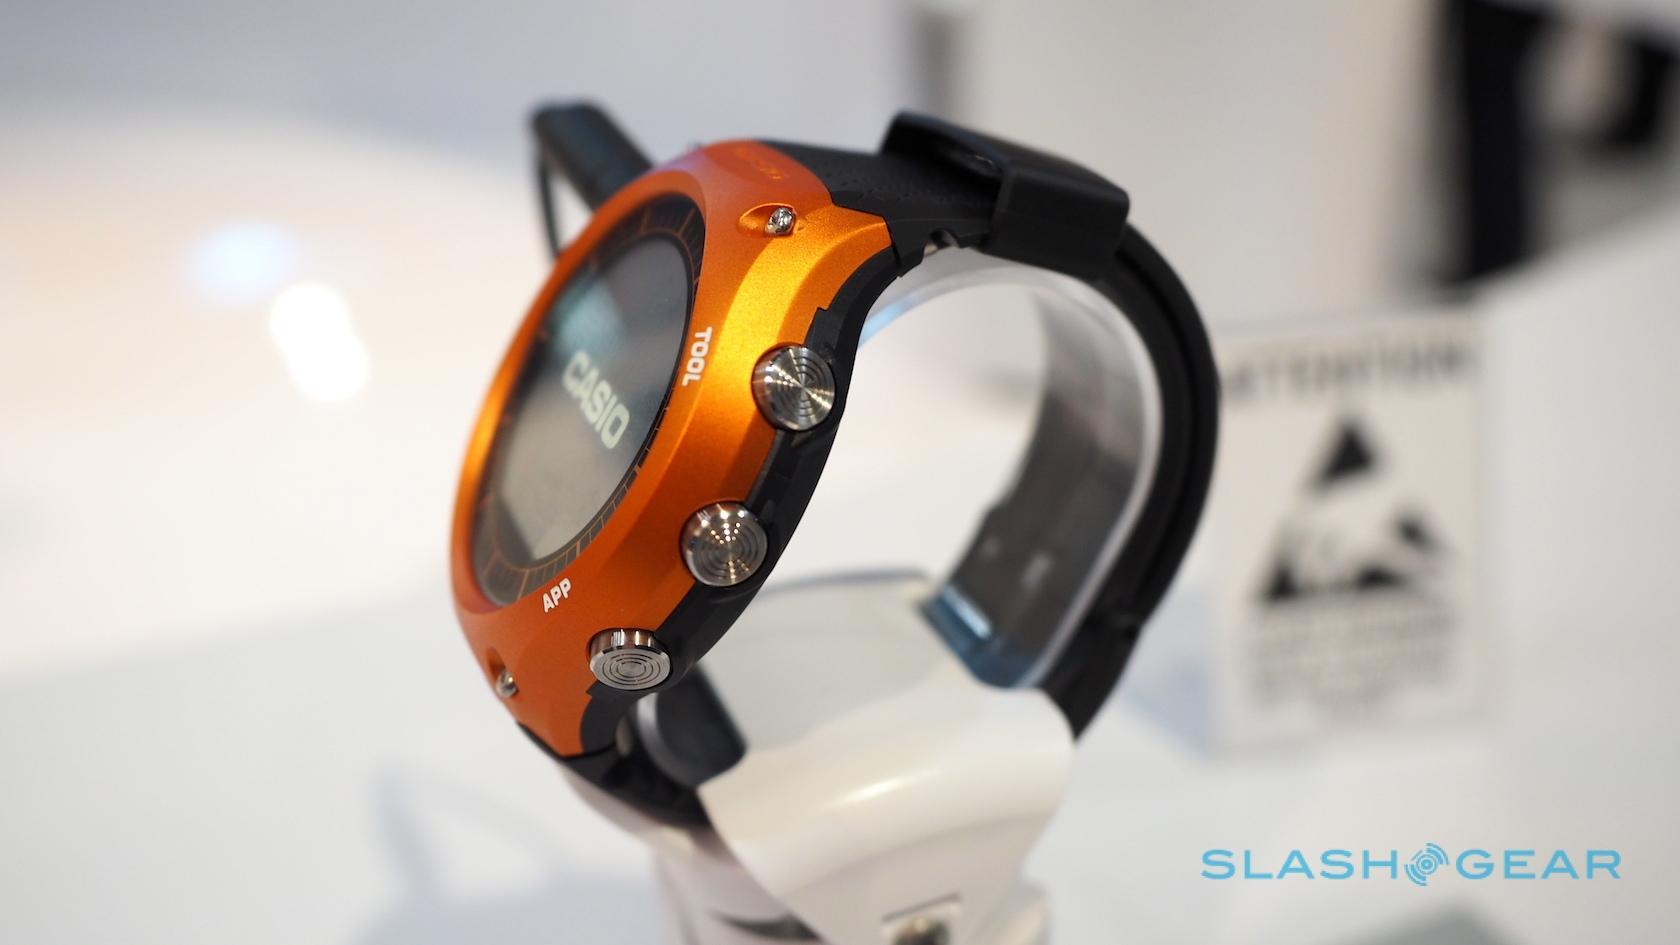 casio-smartwatch-ces-2016-hands-on-sg-4